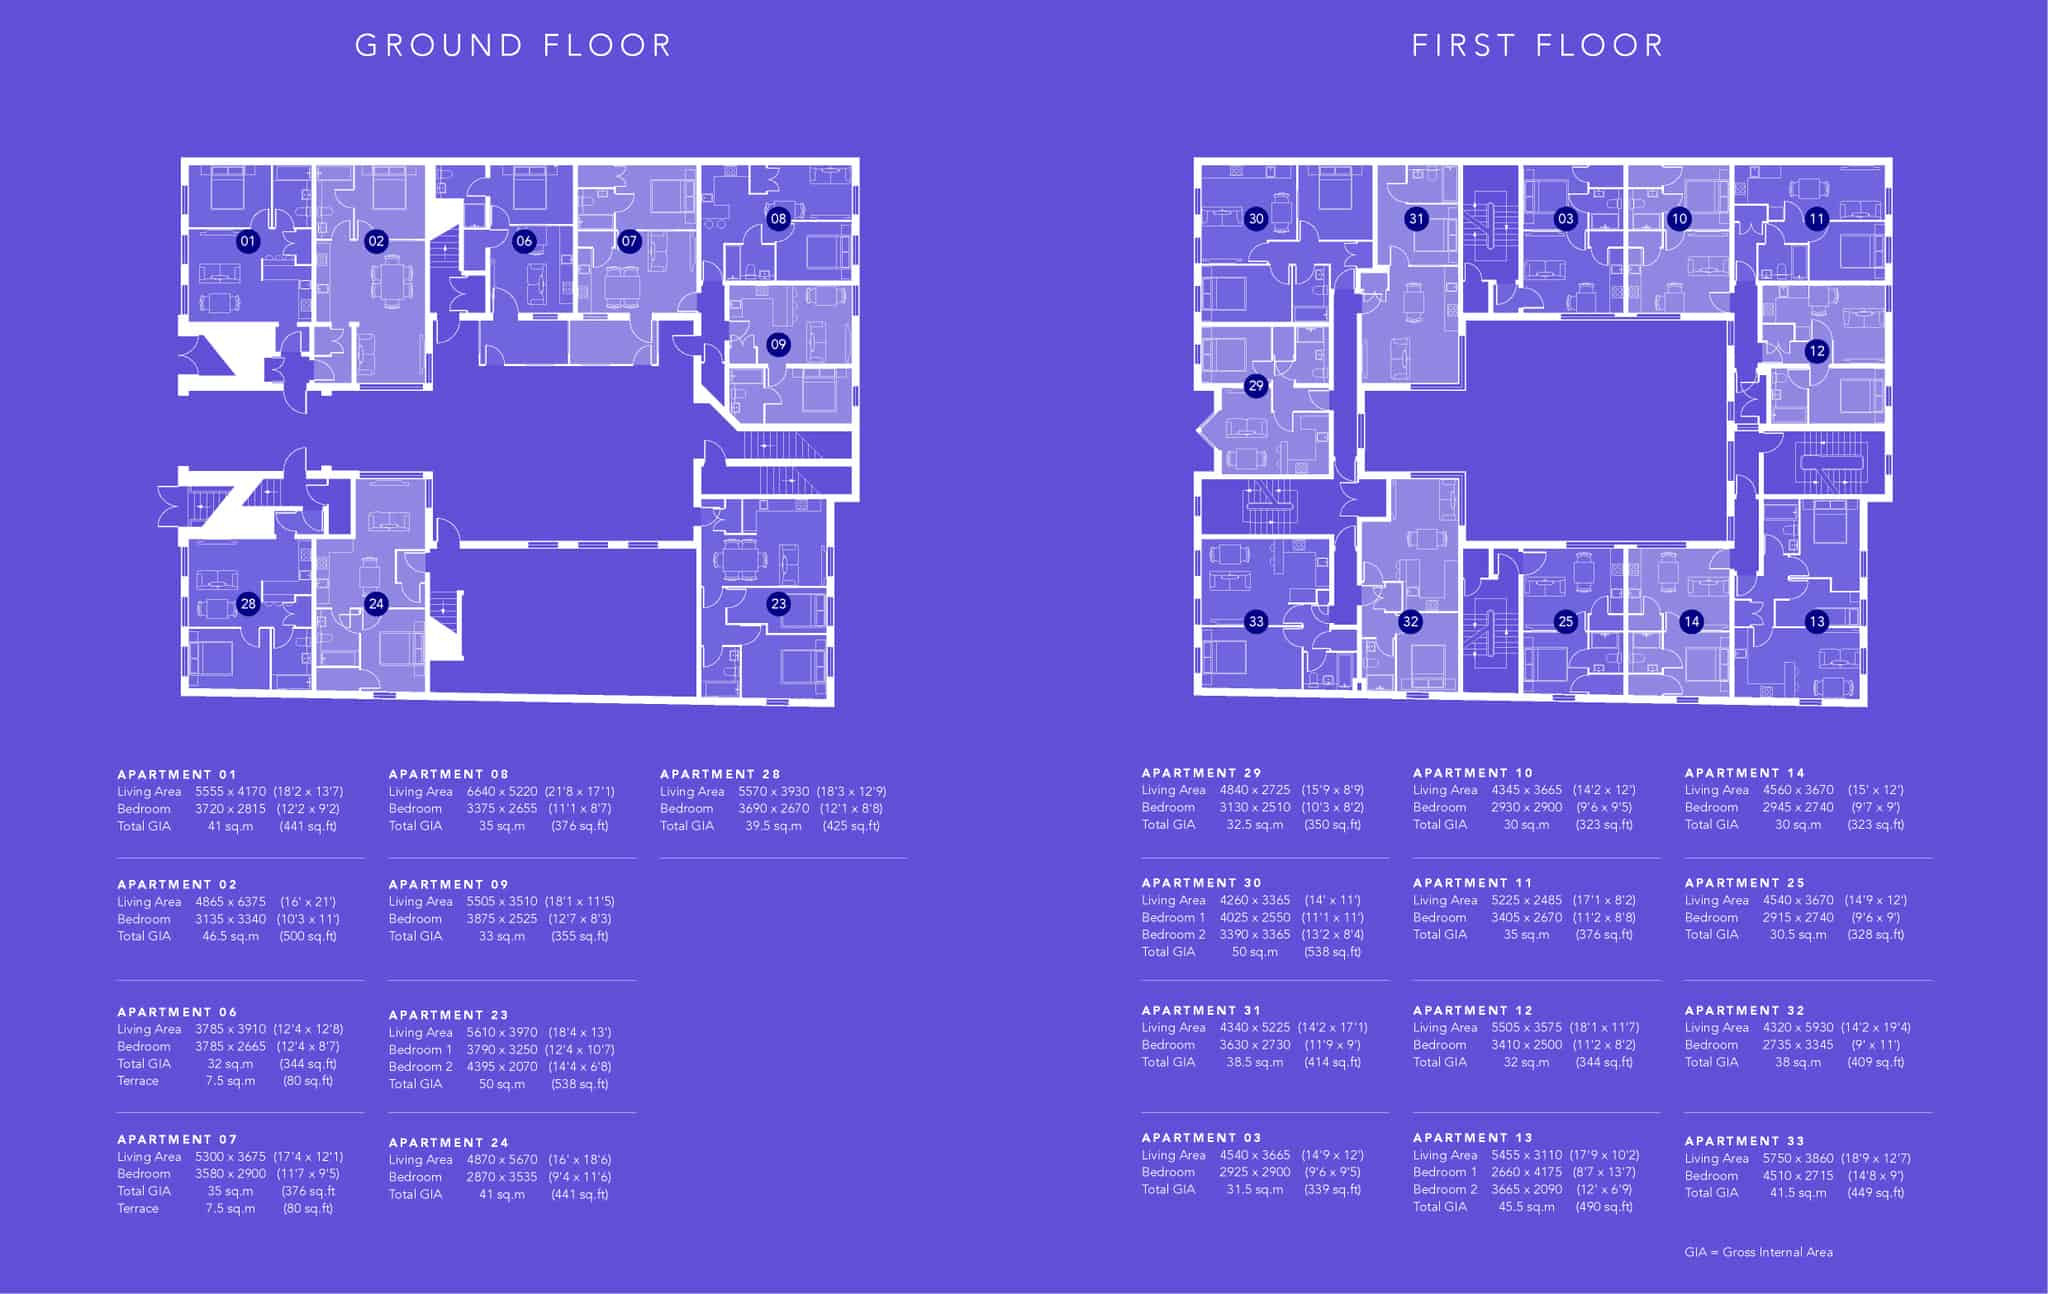 Ocea Saxon Gate Southampton Floorplan Commercial to Residential Property Conversion Apartment